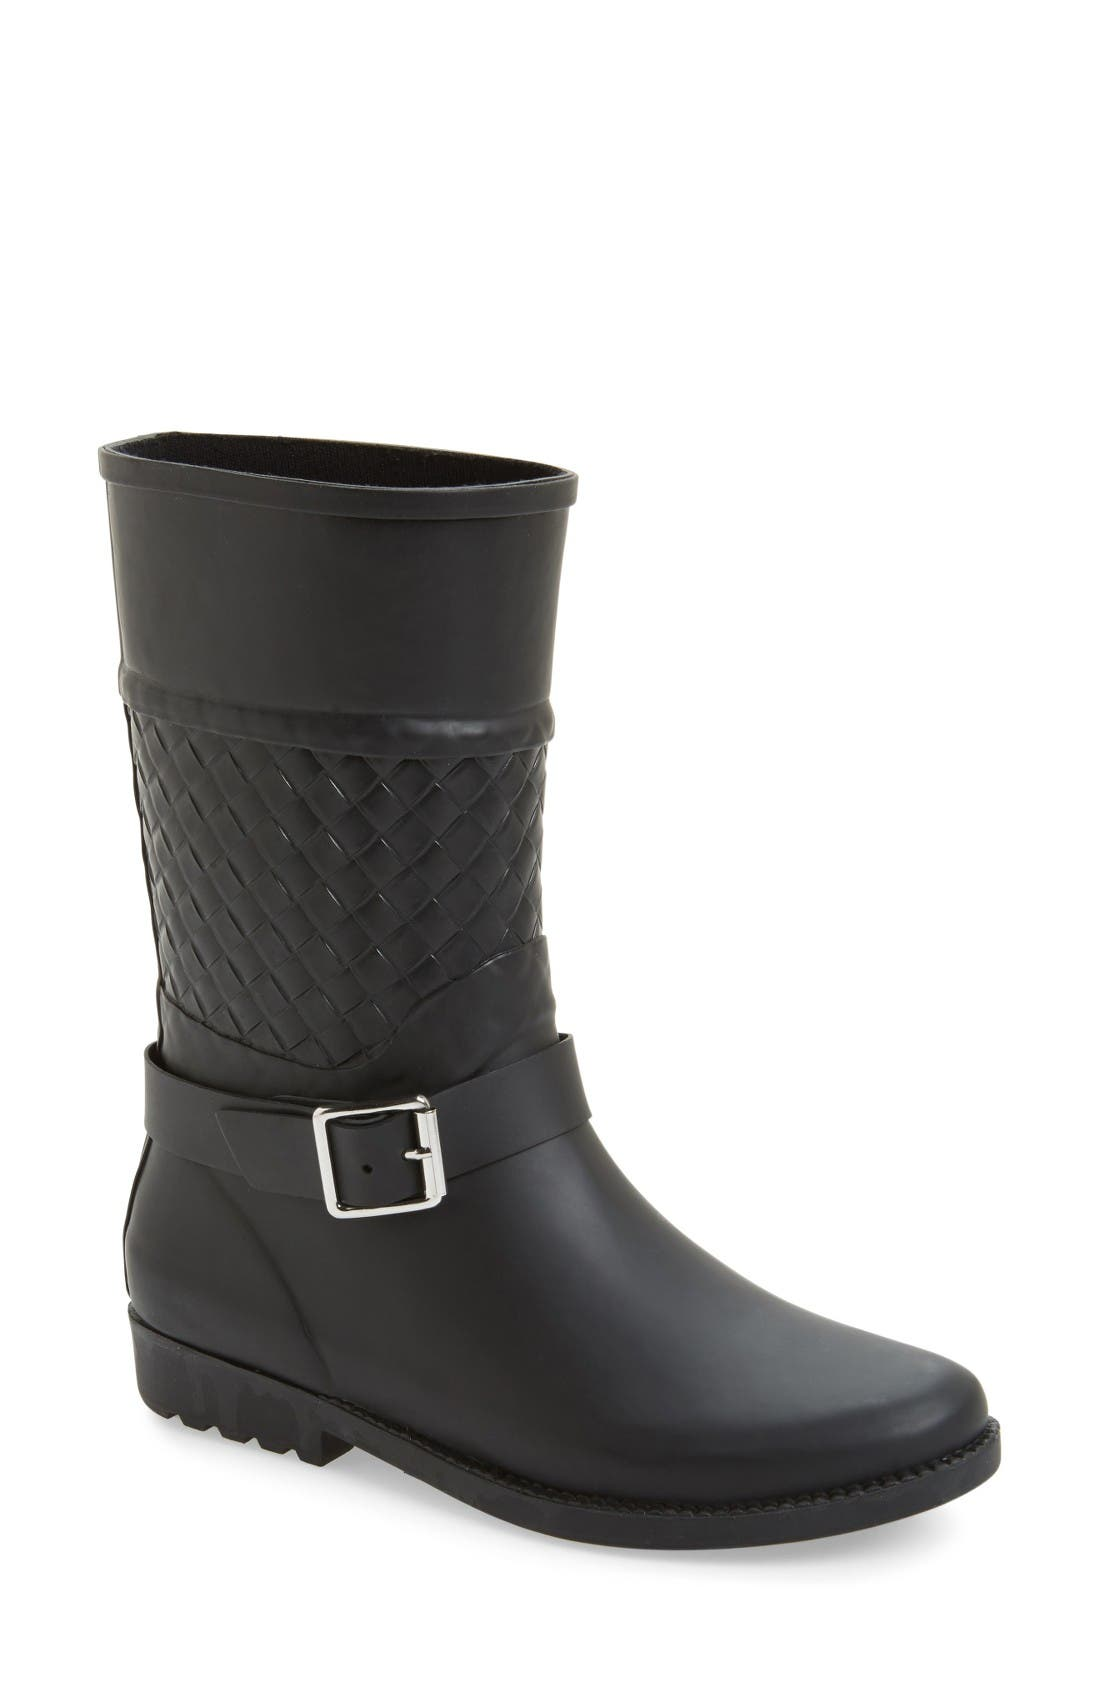 Main Image - däv Weston Waterproof Woven Shaft Rain Boot (Women)